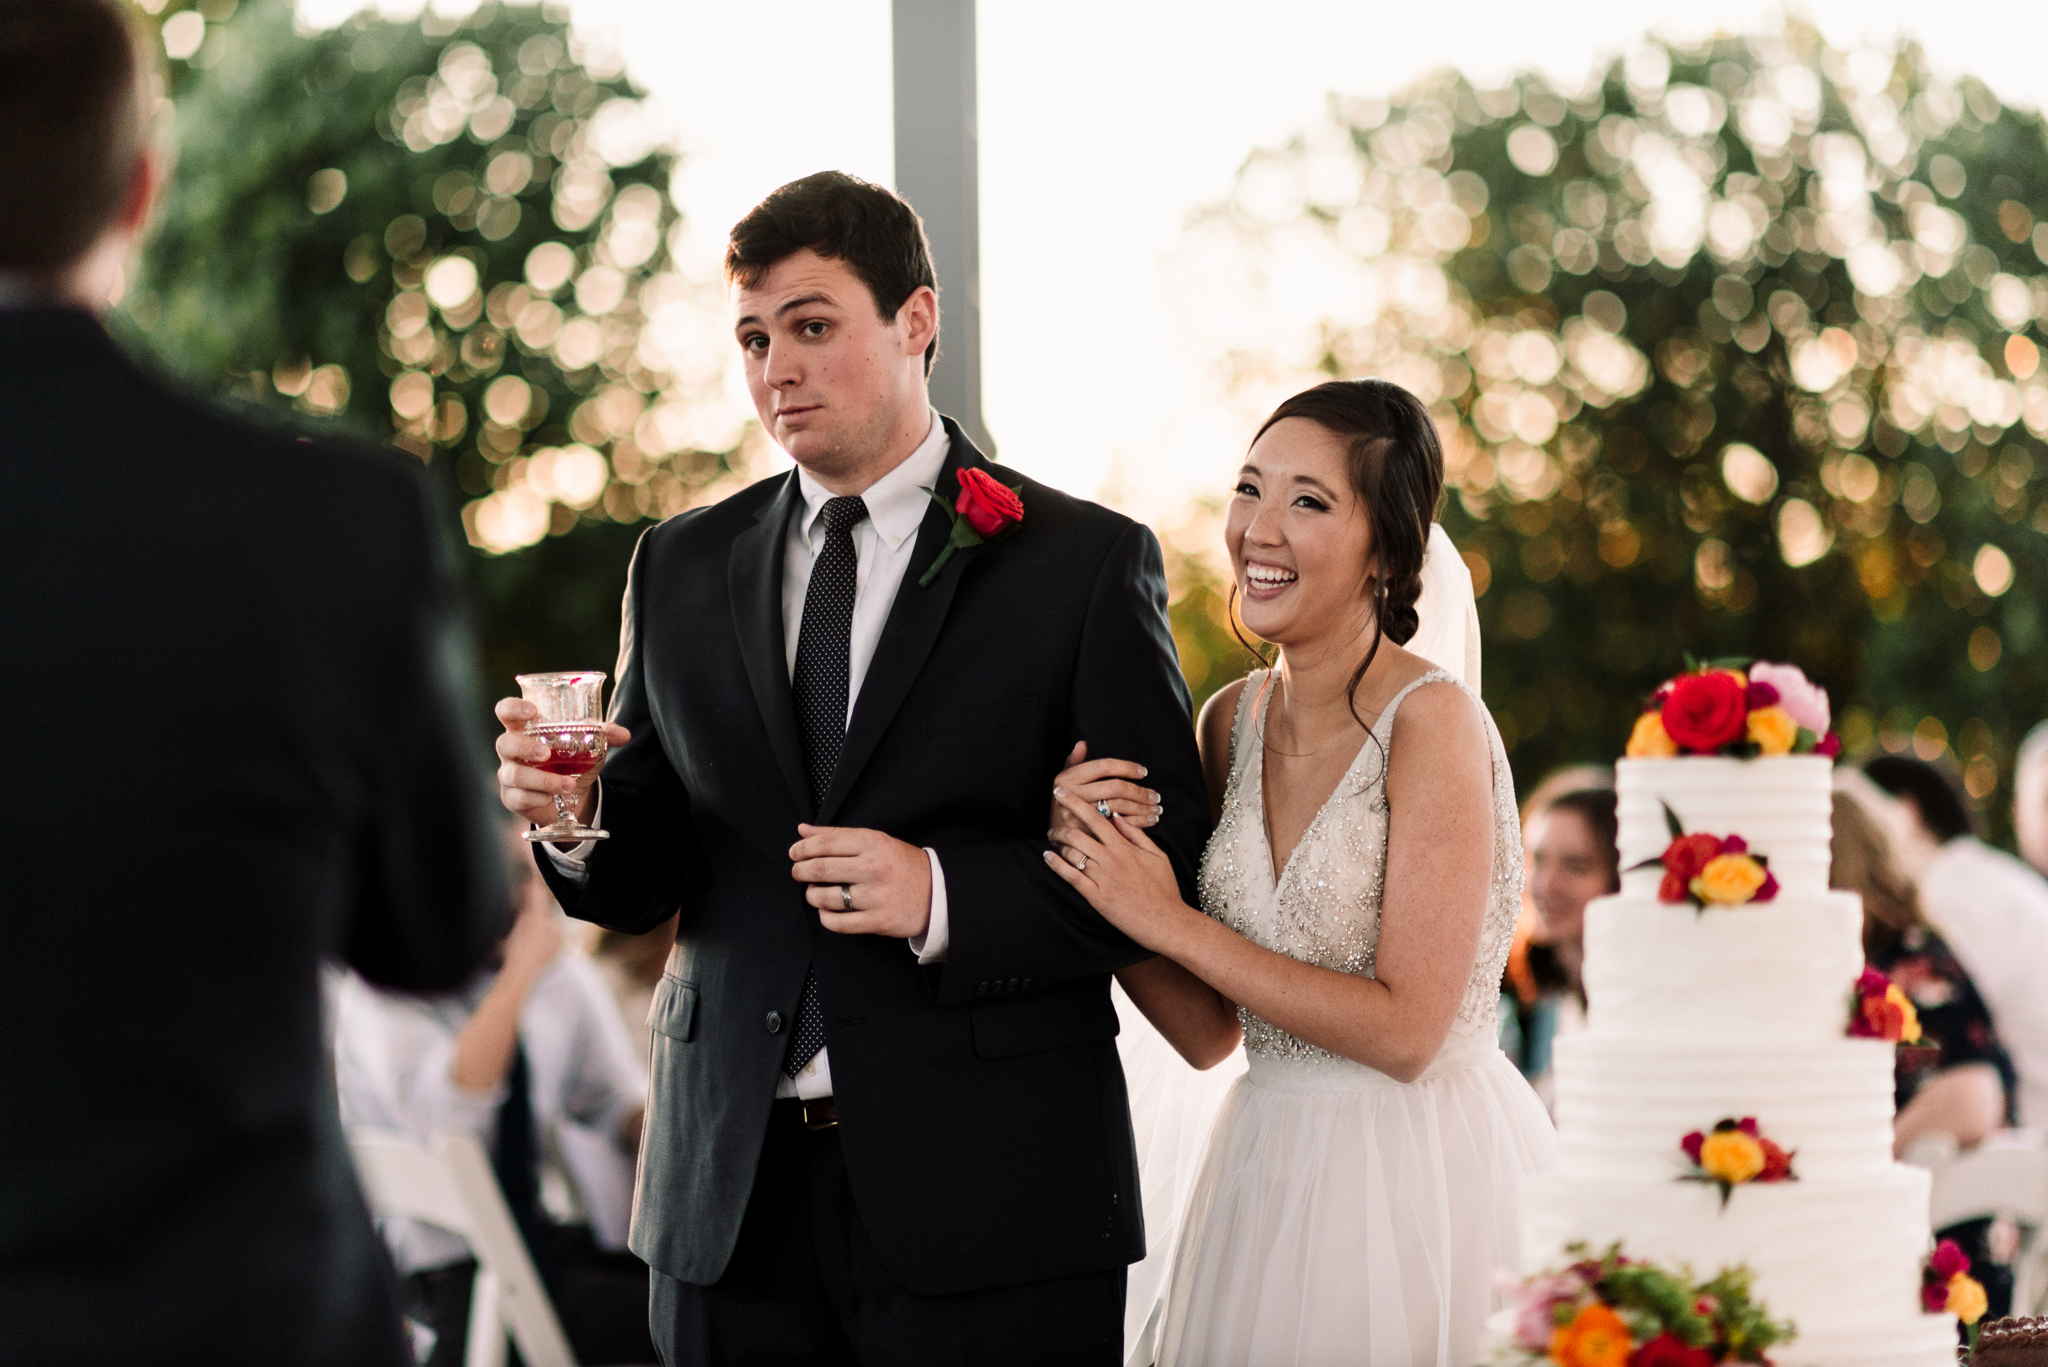 Oklahoma-Christian-University-Wedding-0488.jpg